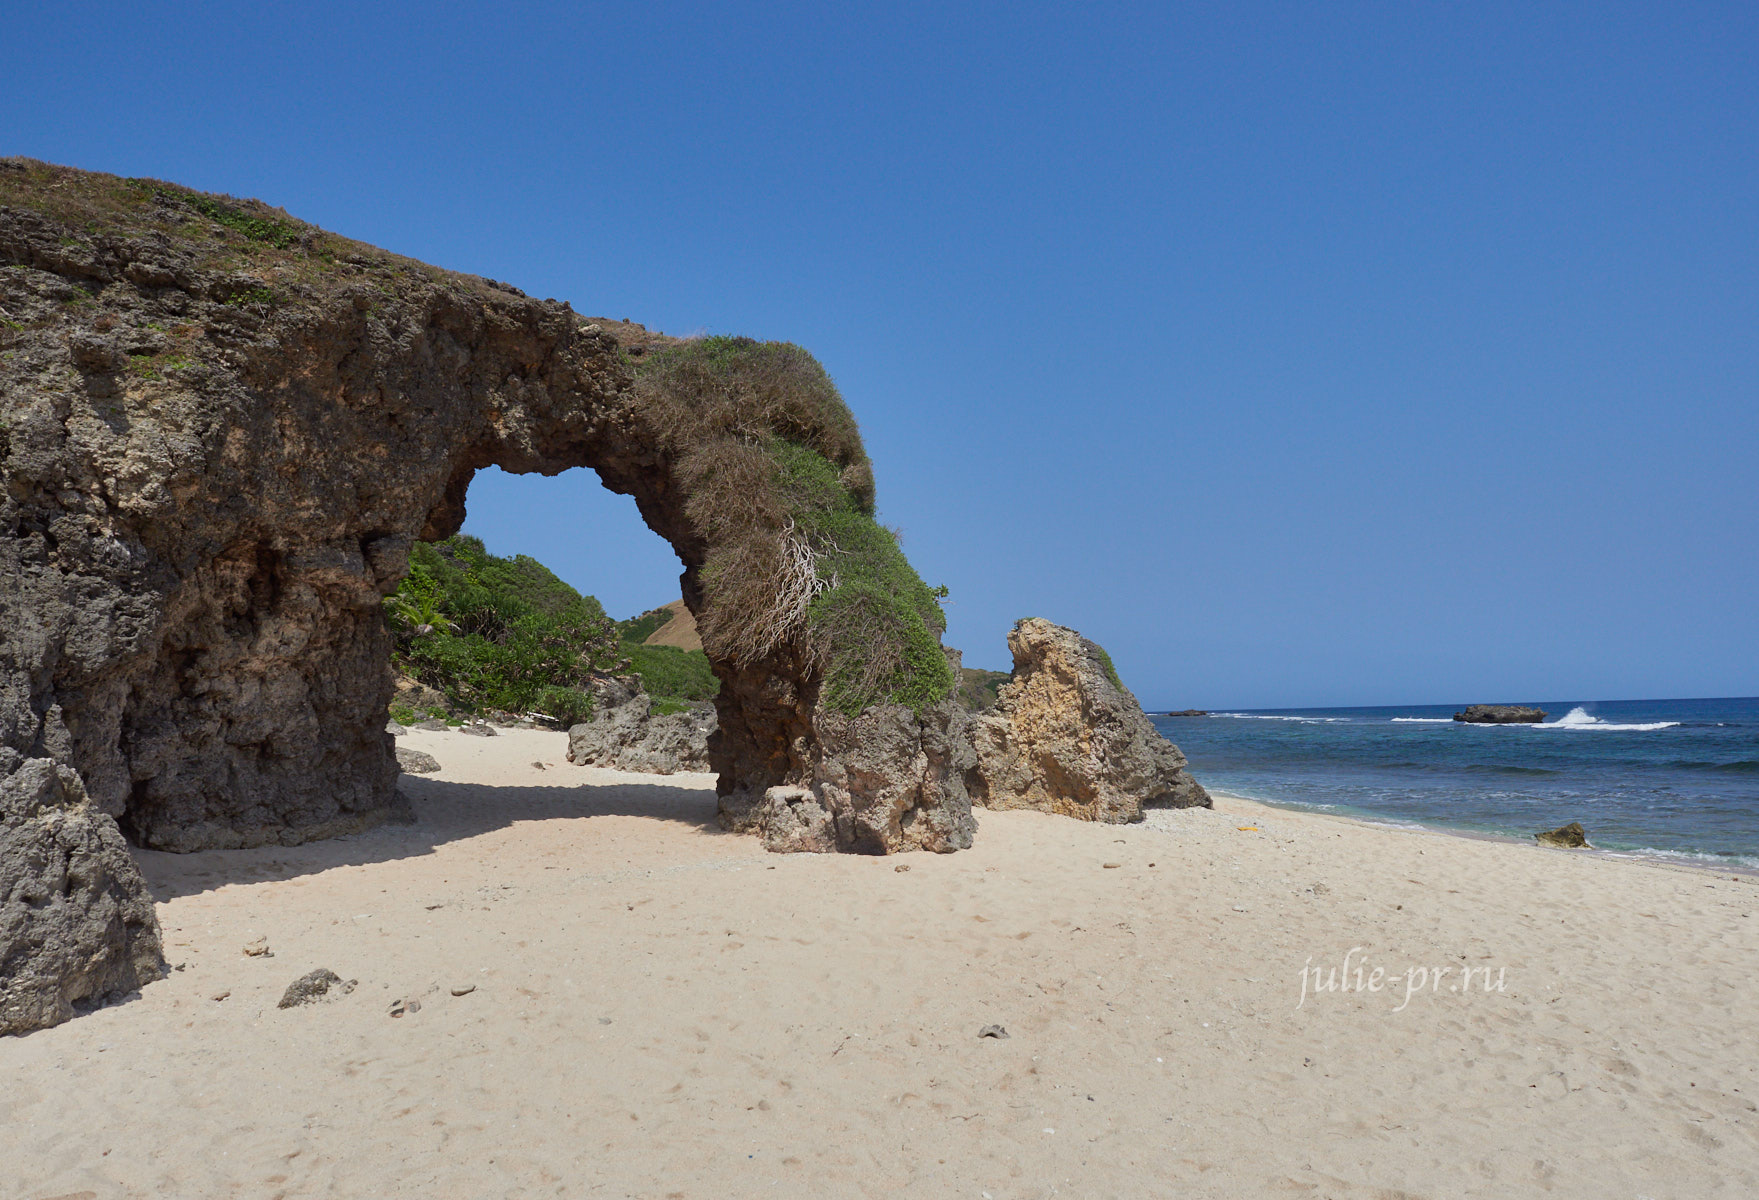 Поездка на острова Батанес: 3. Остров Сабтанг